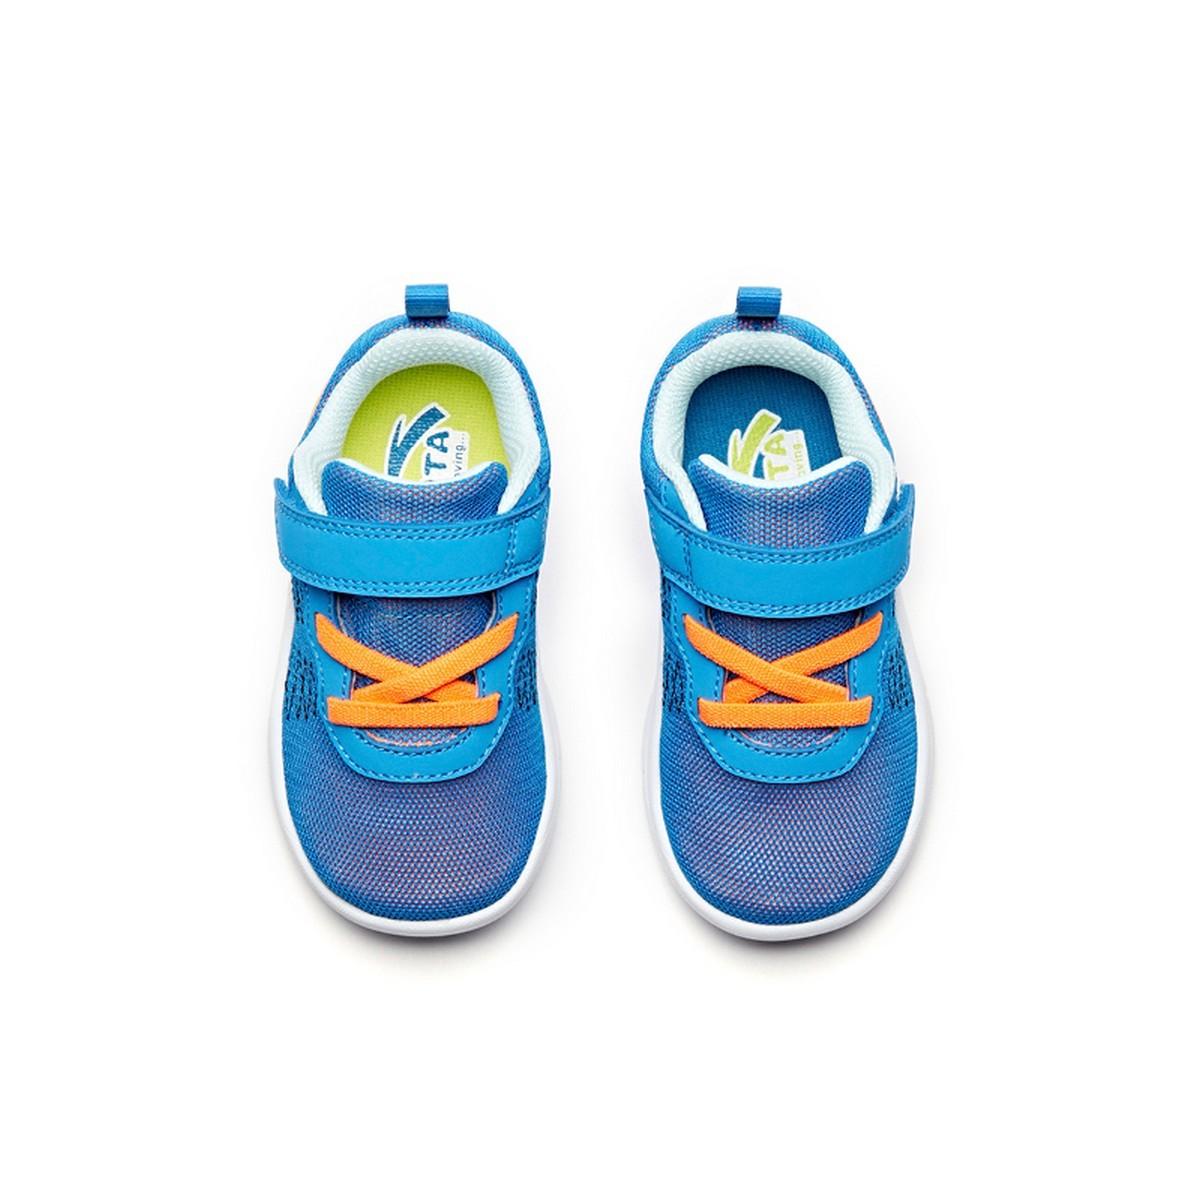 ANTA 安踏 儿童防滑软底运动鞋